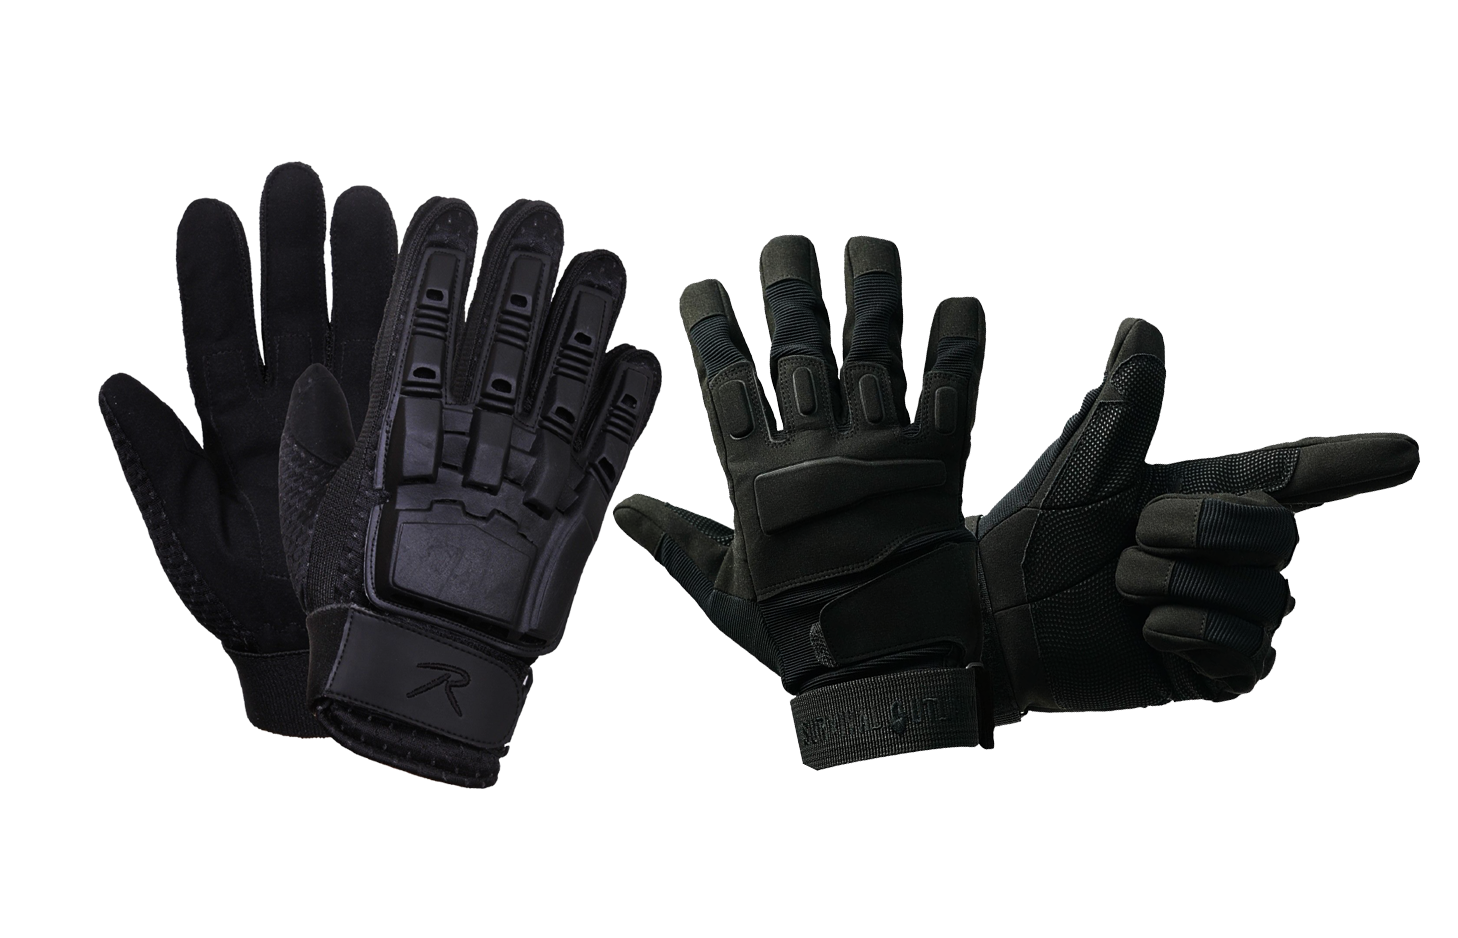 shooting tactical gloves at bereli